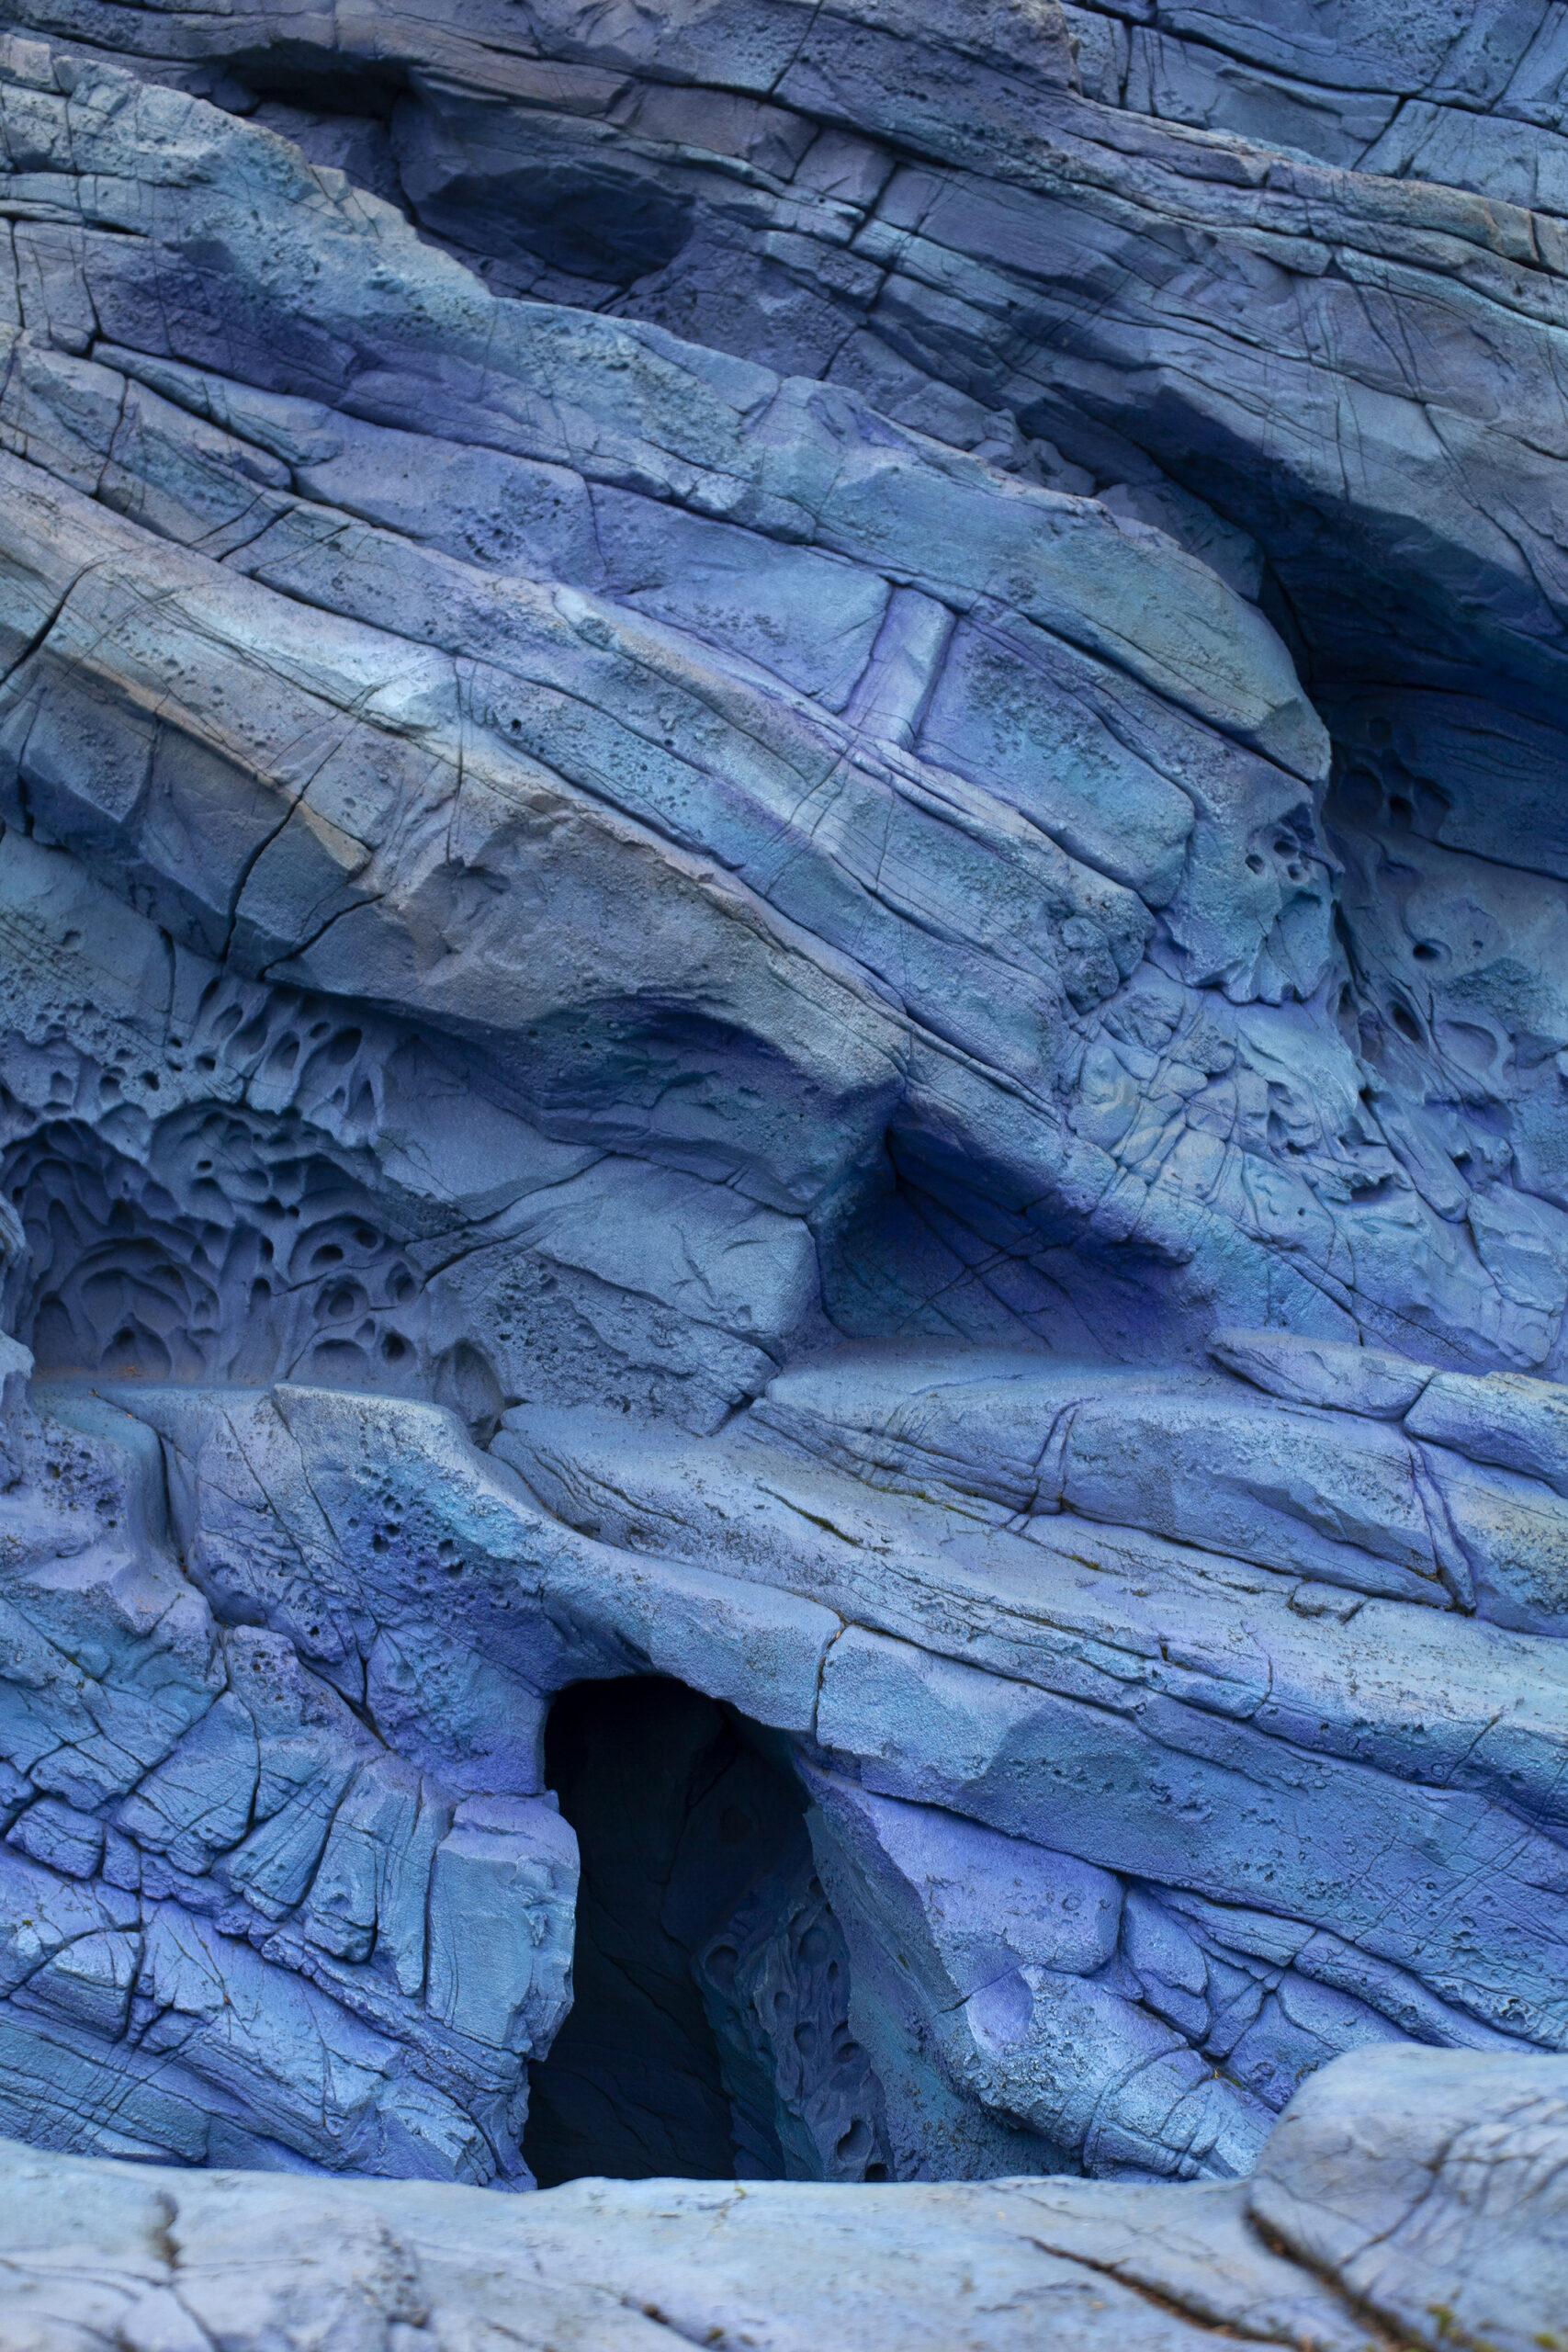 Pia Kintrup_the glacier_the nonexistent areas are of particular interest_C-Print auf Alu Dibond, Schattenfuge_100cmx66cm